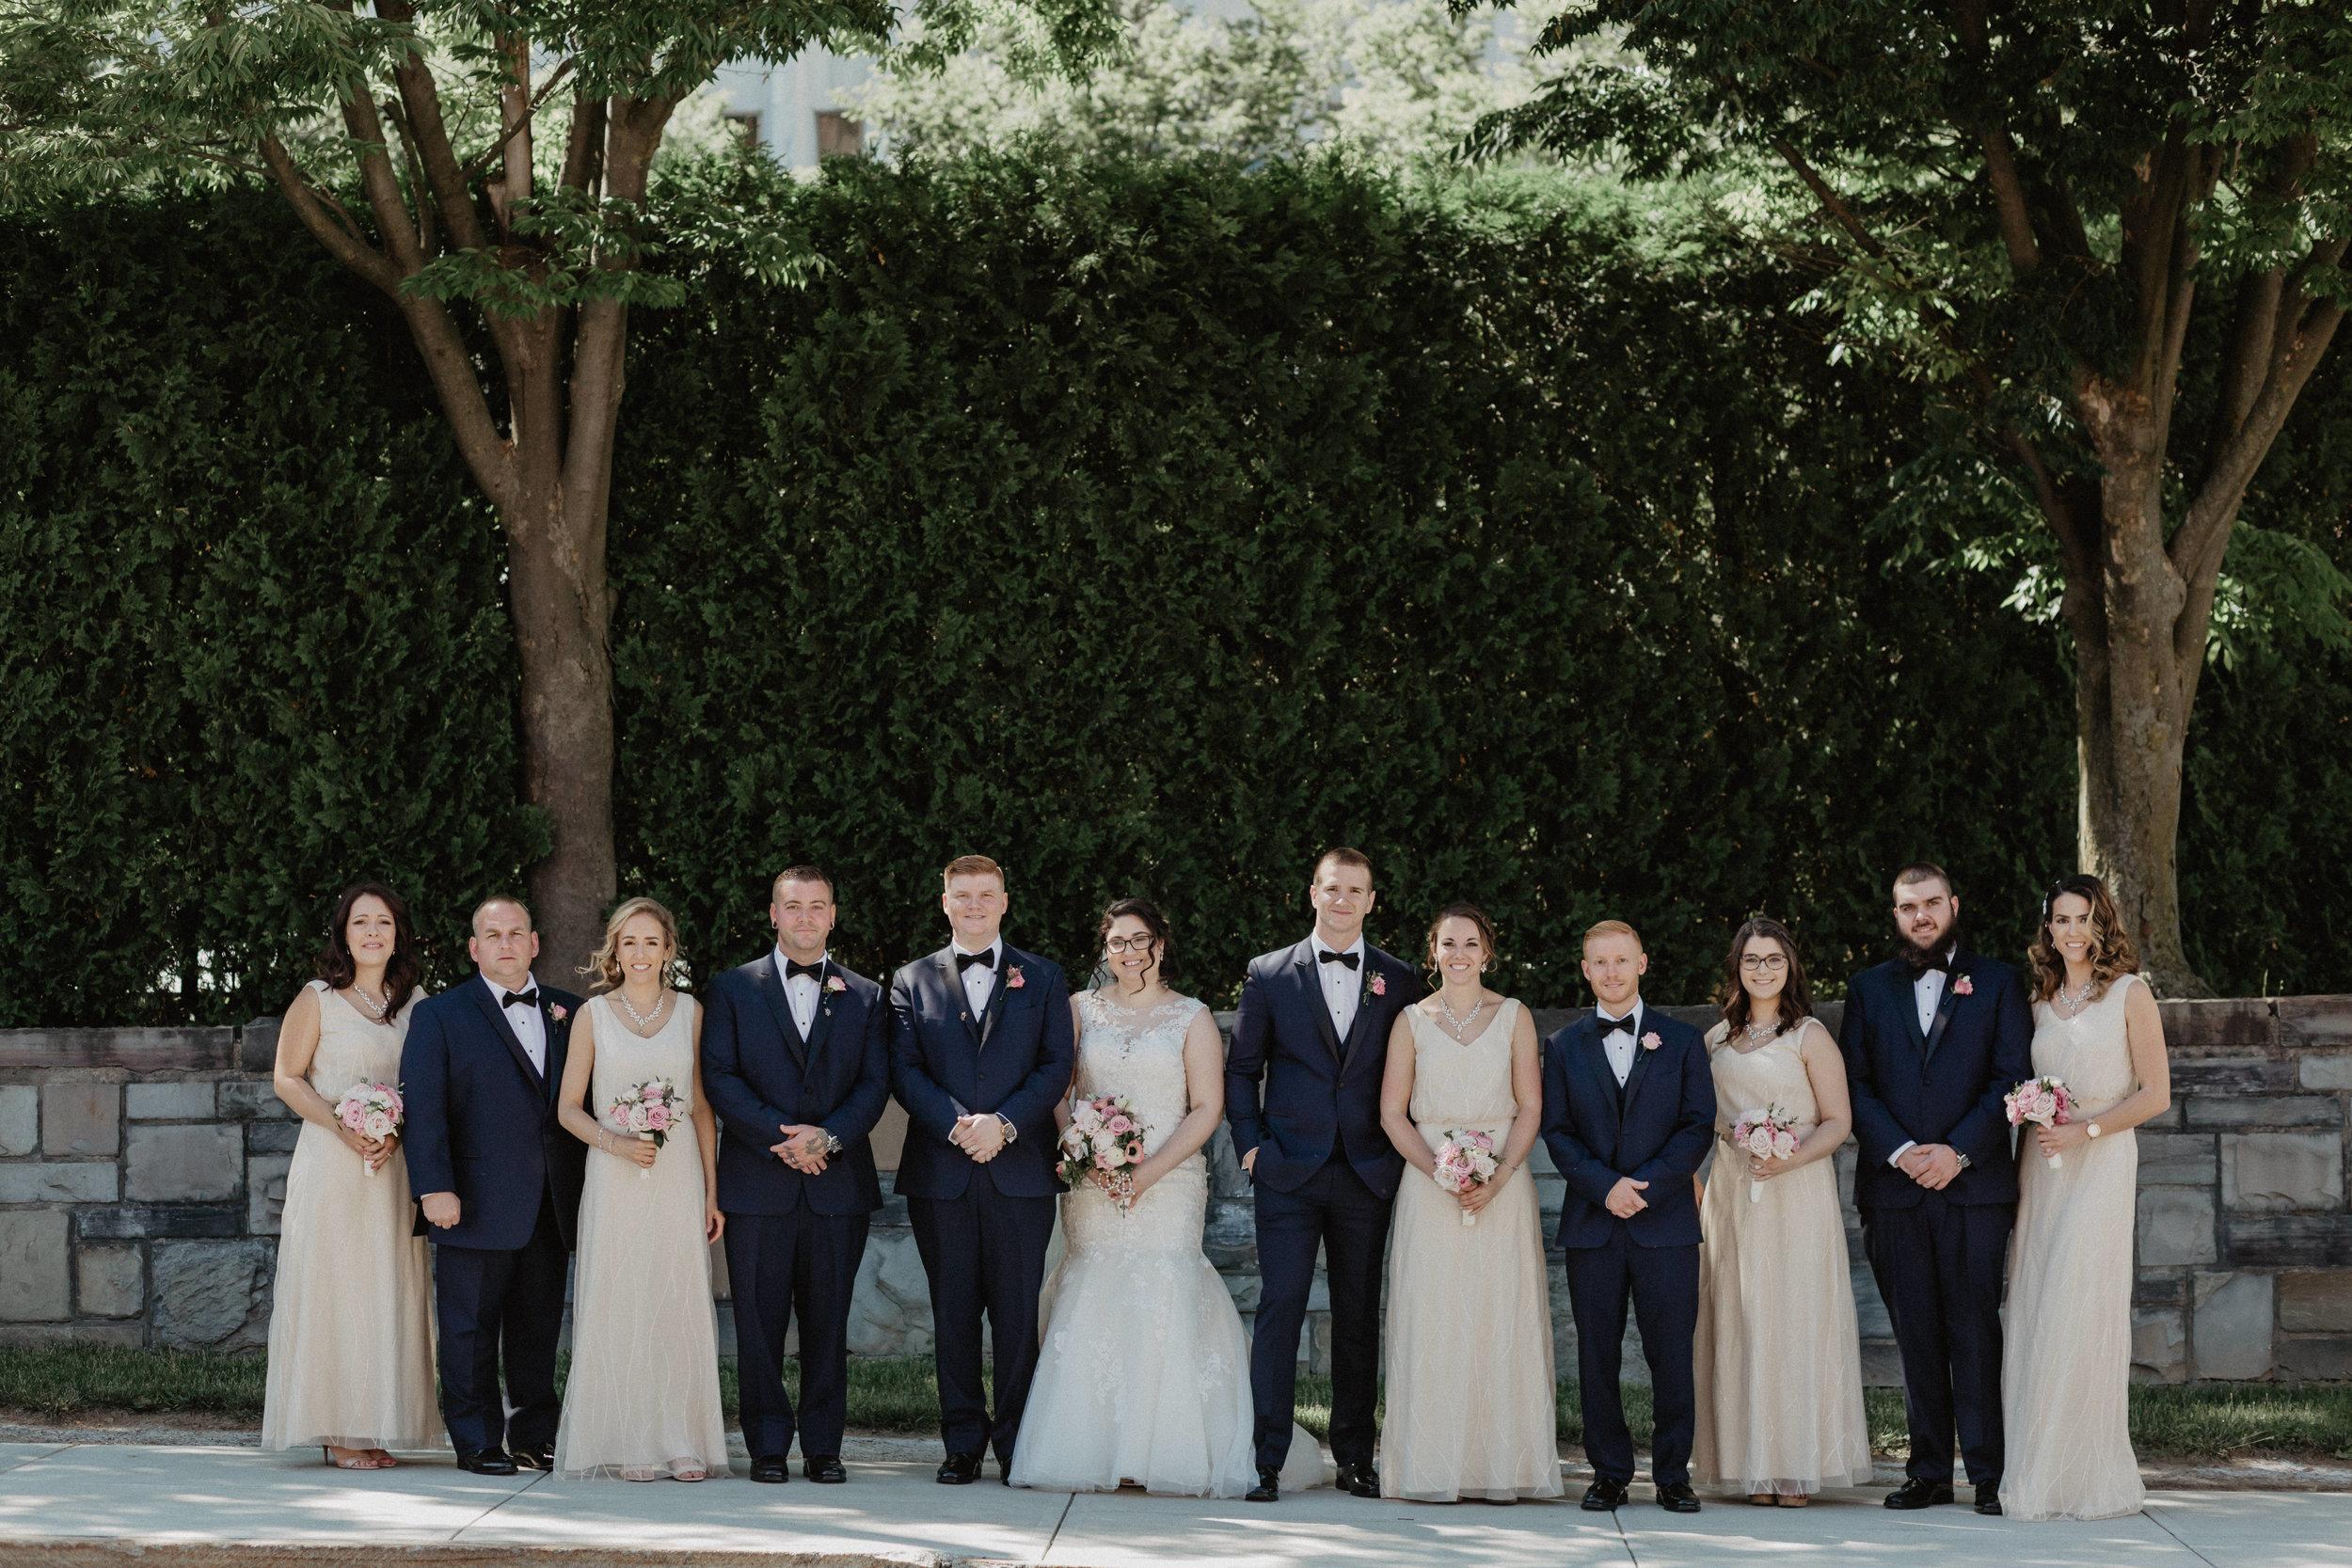 albany-new-york-wedding-29.jpg